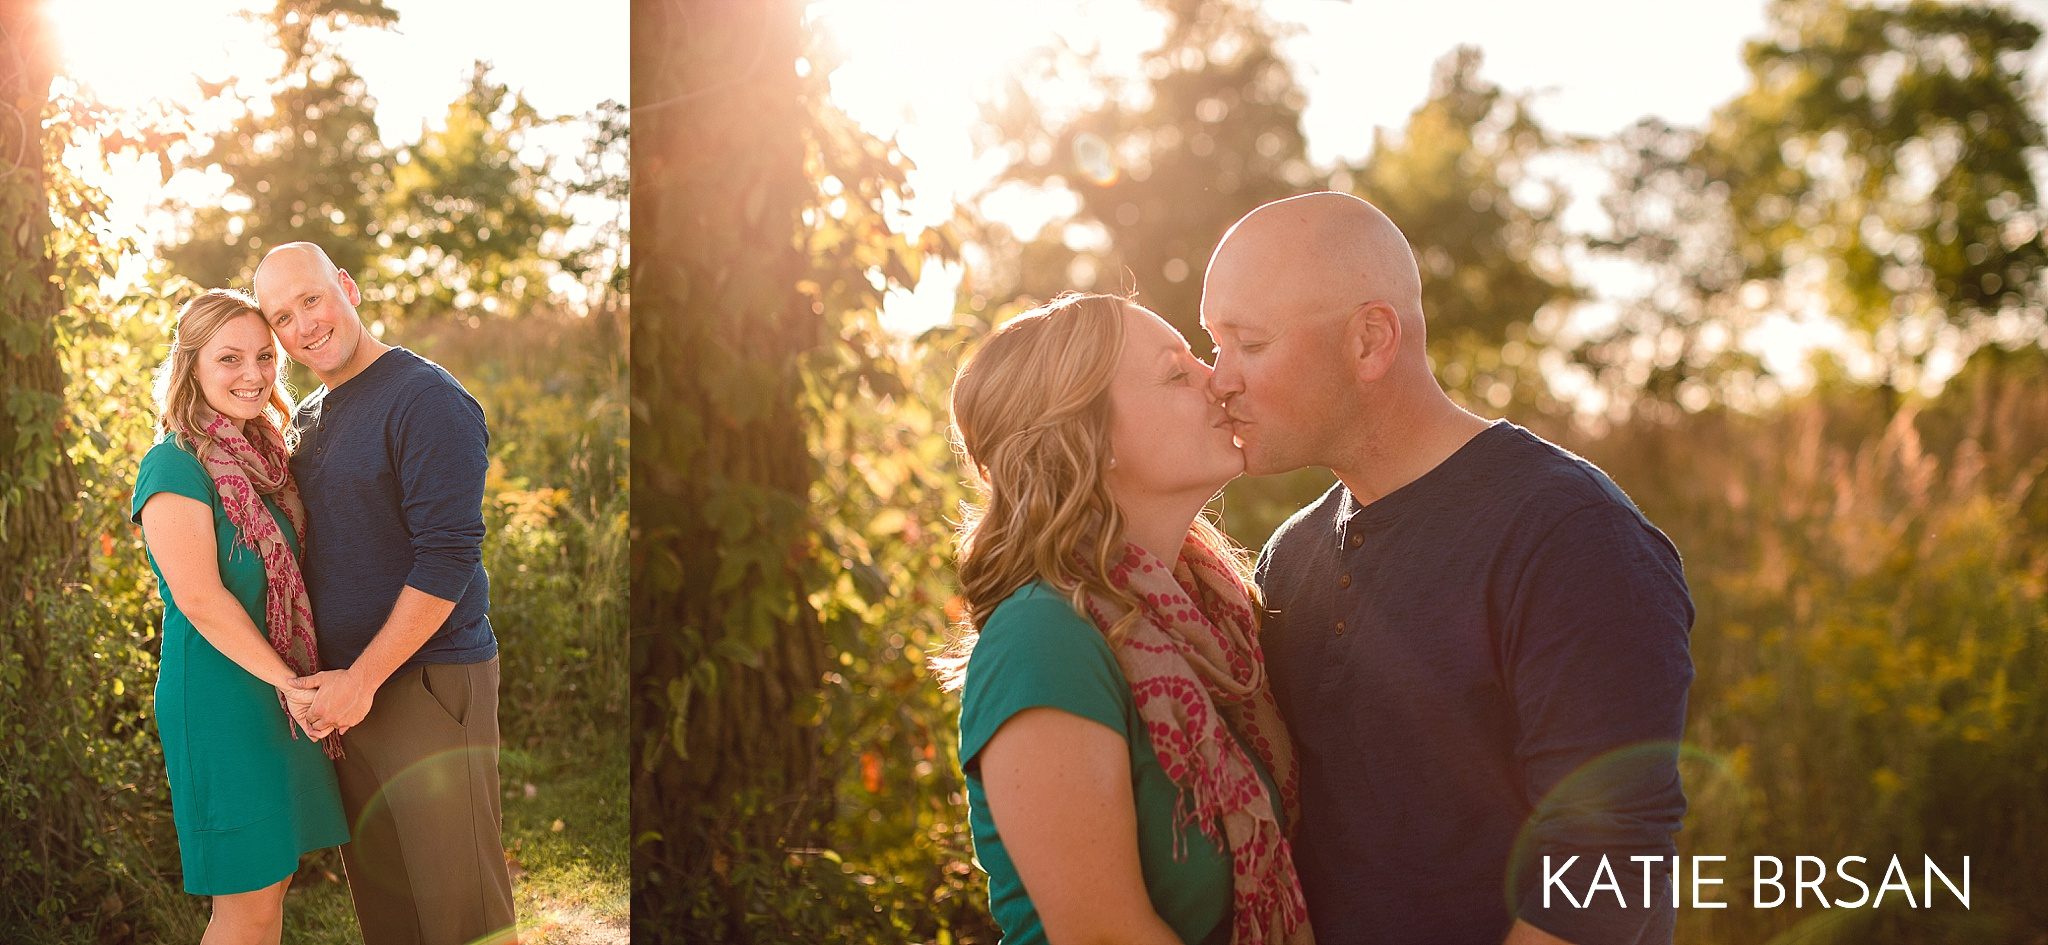 KatieBrsan-Chicago-Suburban-EngagementPictures-HadlyValley_0573.jpg